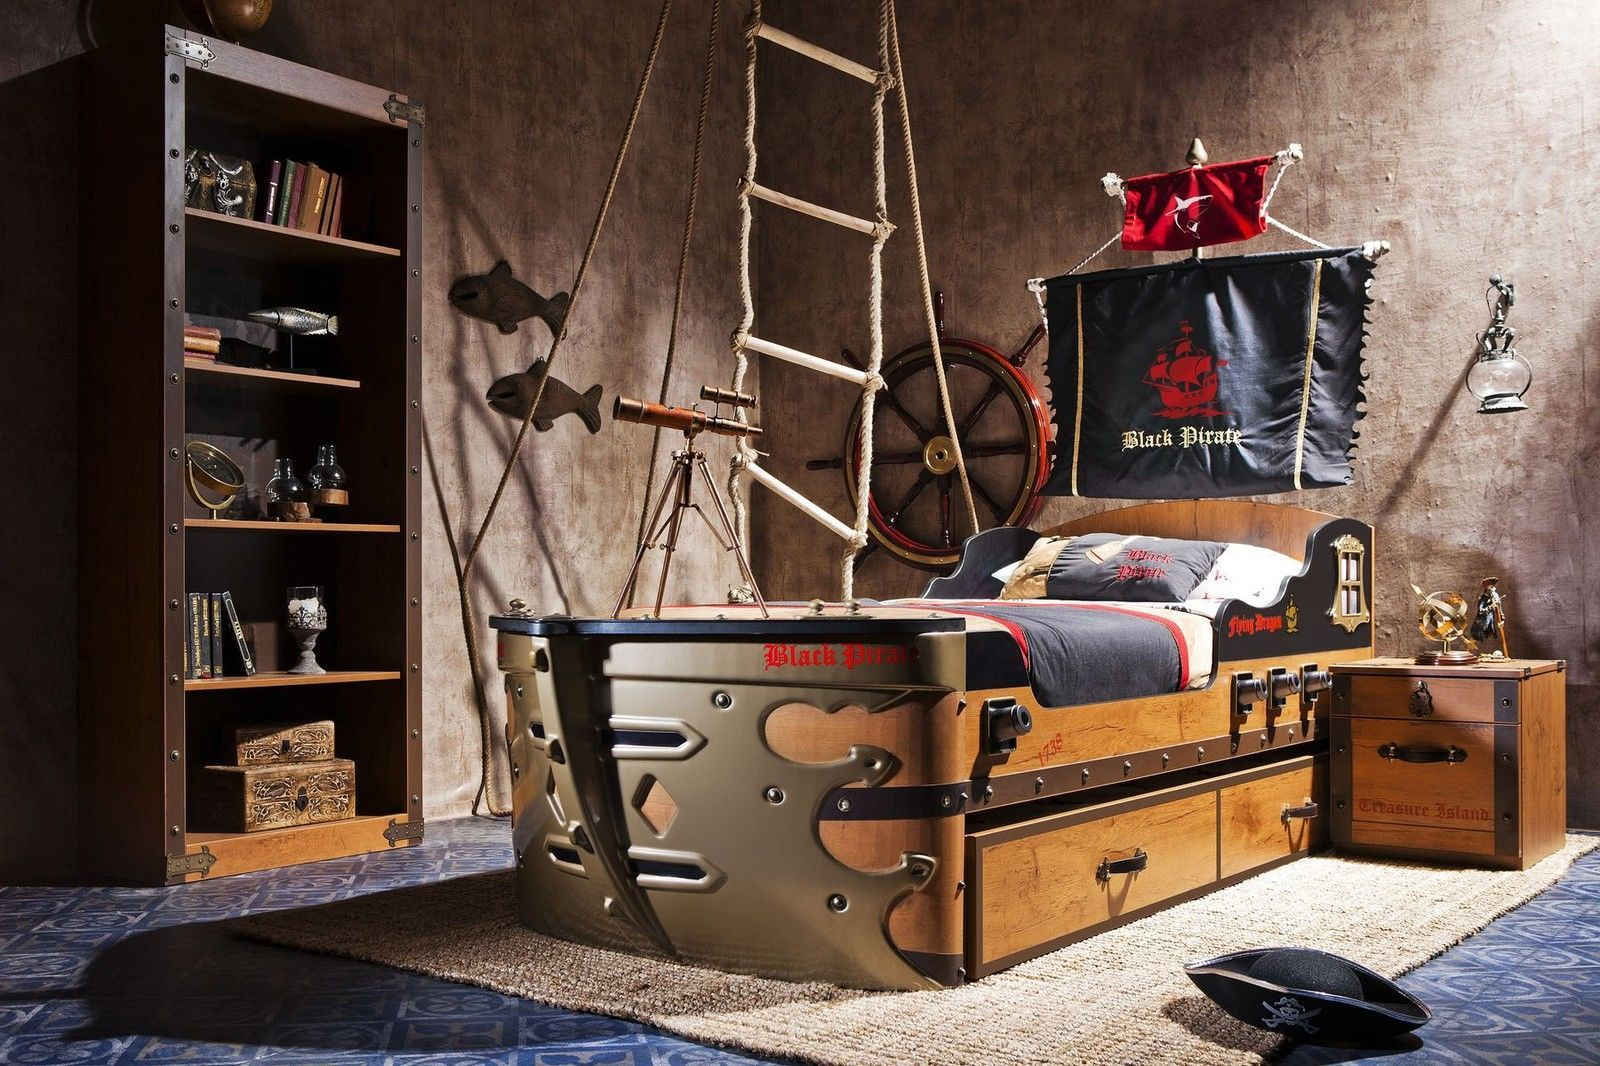 schiffbett black pirate cilek m bel kinderbett kinderm bel tuv gs jugendbett pinterest. Black Bedroom Furniture Sets. Home Design Ideas